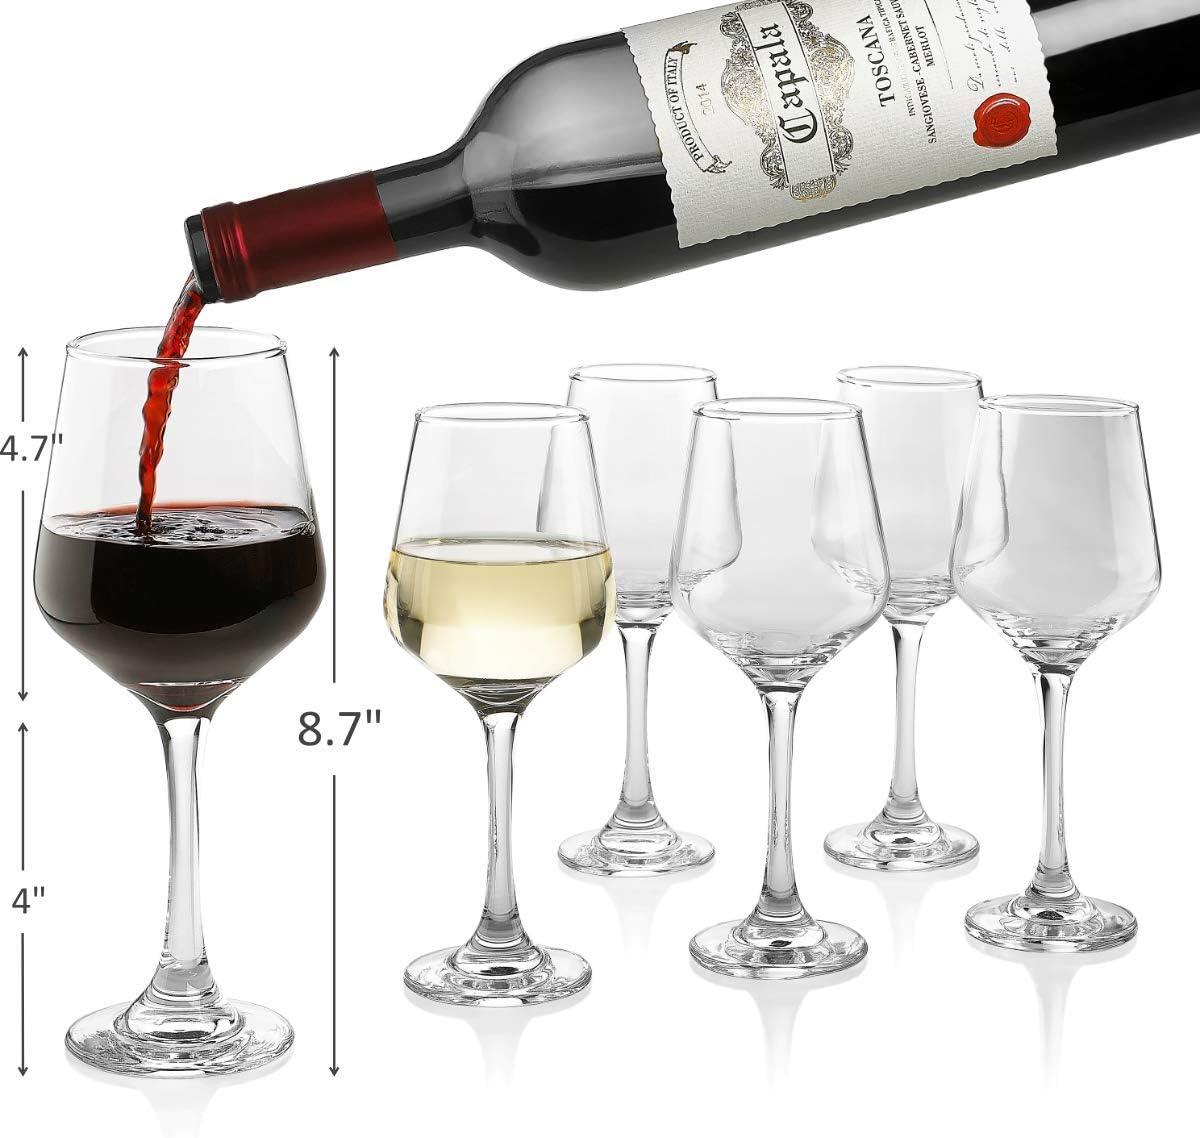 Premium Wine Glasses 14 Ounce - Classic Free Max 65% OFF Clear Ranking TOP2 Gla Lead